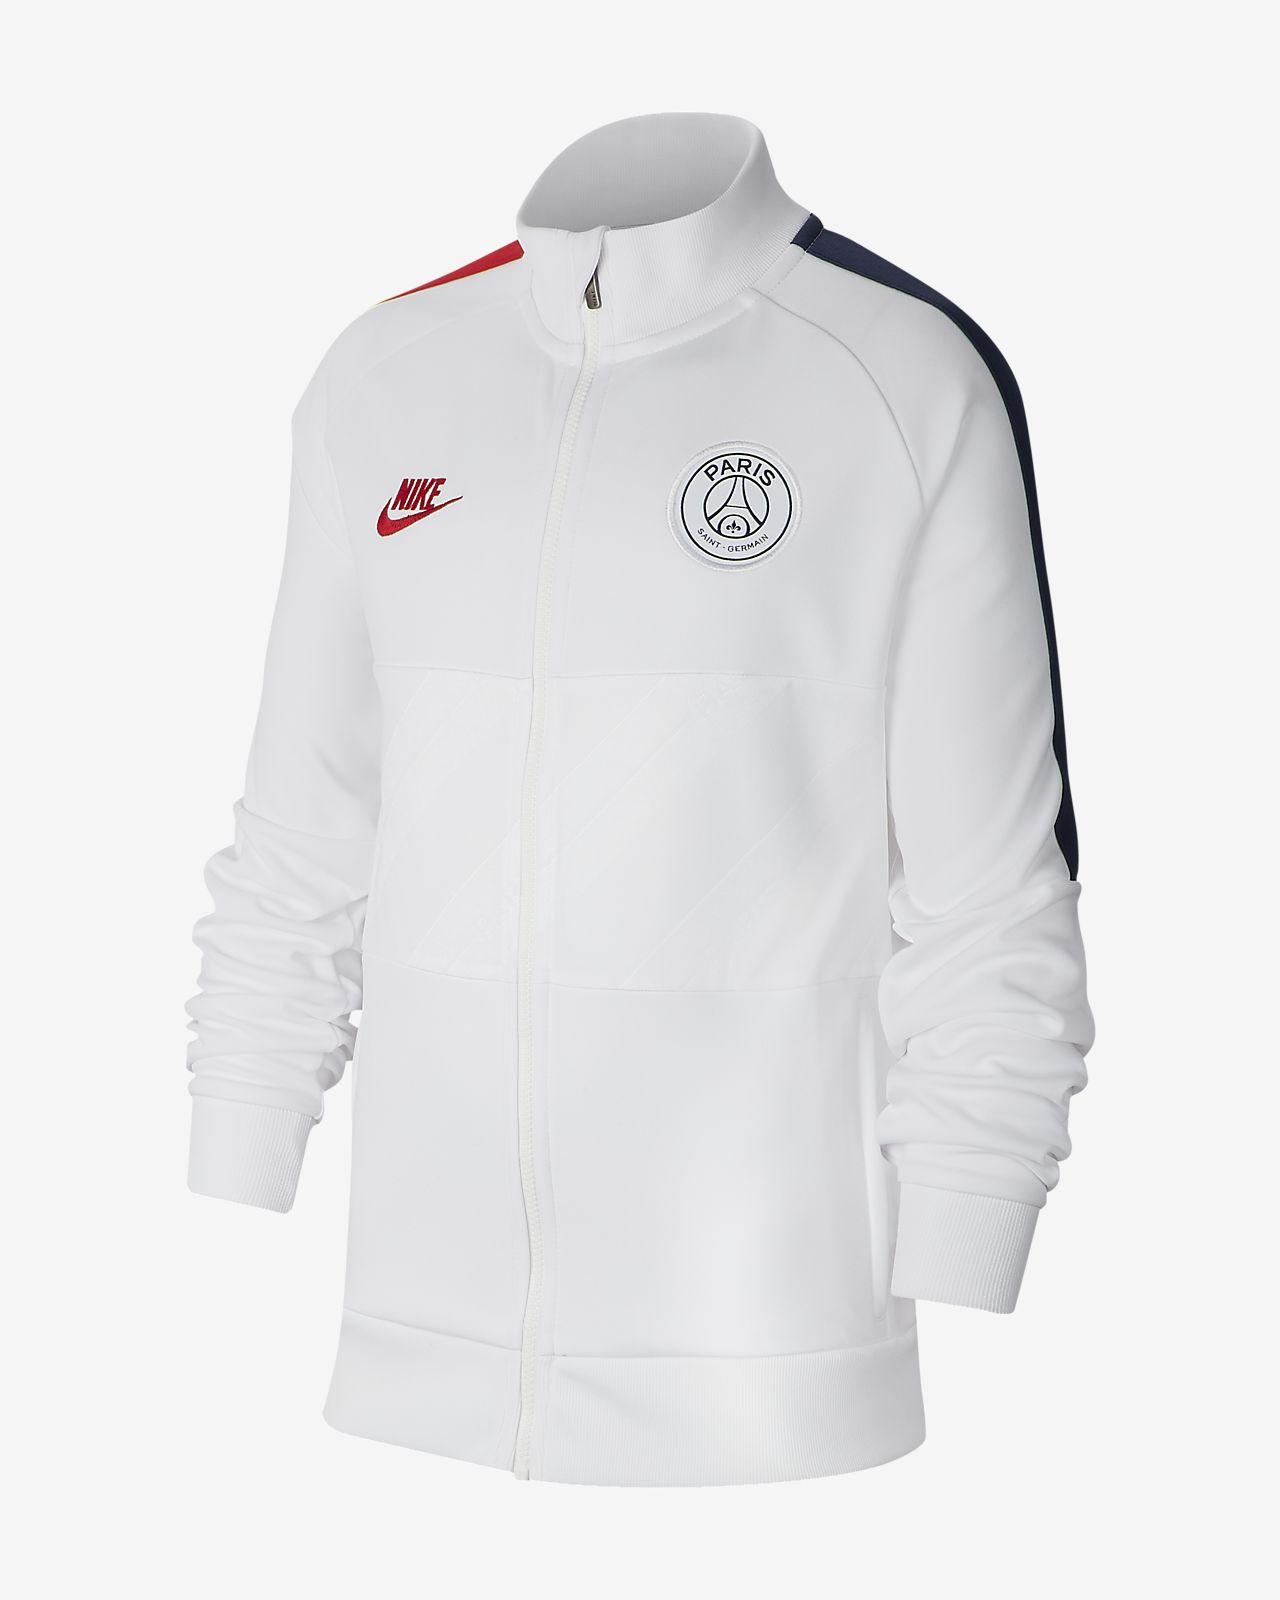 Dětská fotbalová bunda Paris Saint-Germain